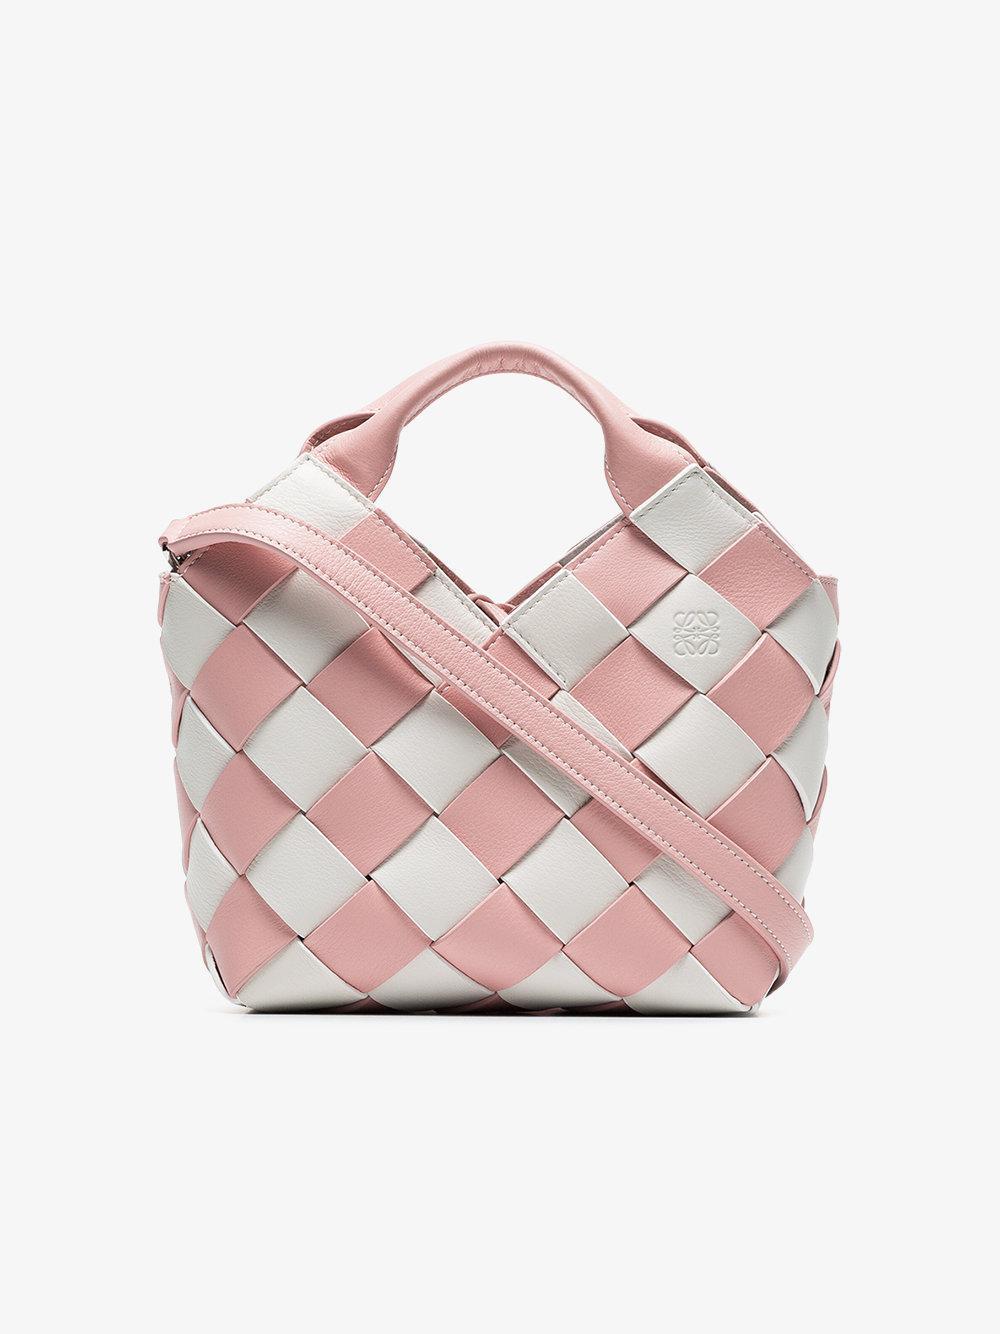 pink and white woven basket gingham mini leather bag Loewe jeoAQlRoJ